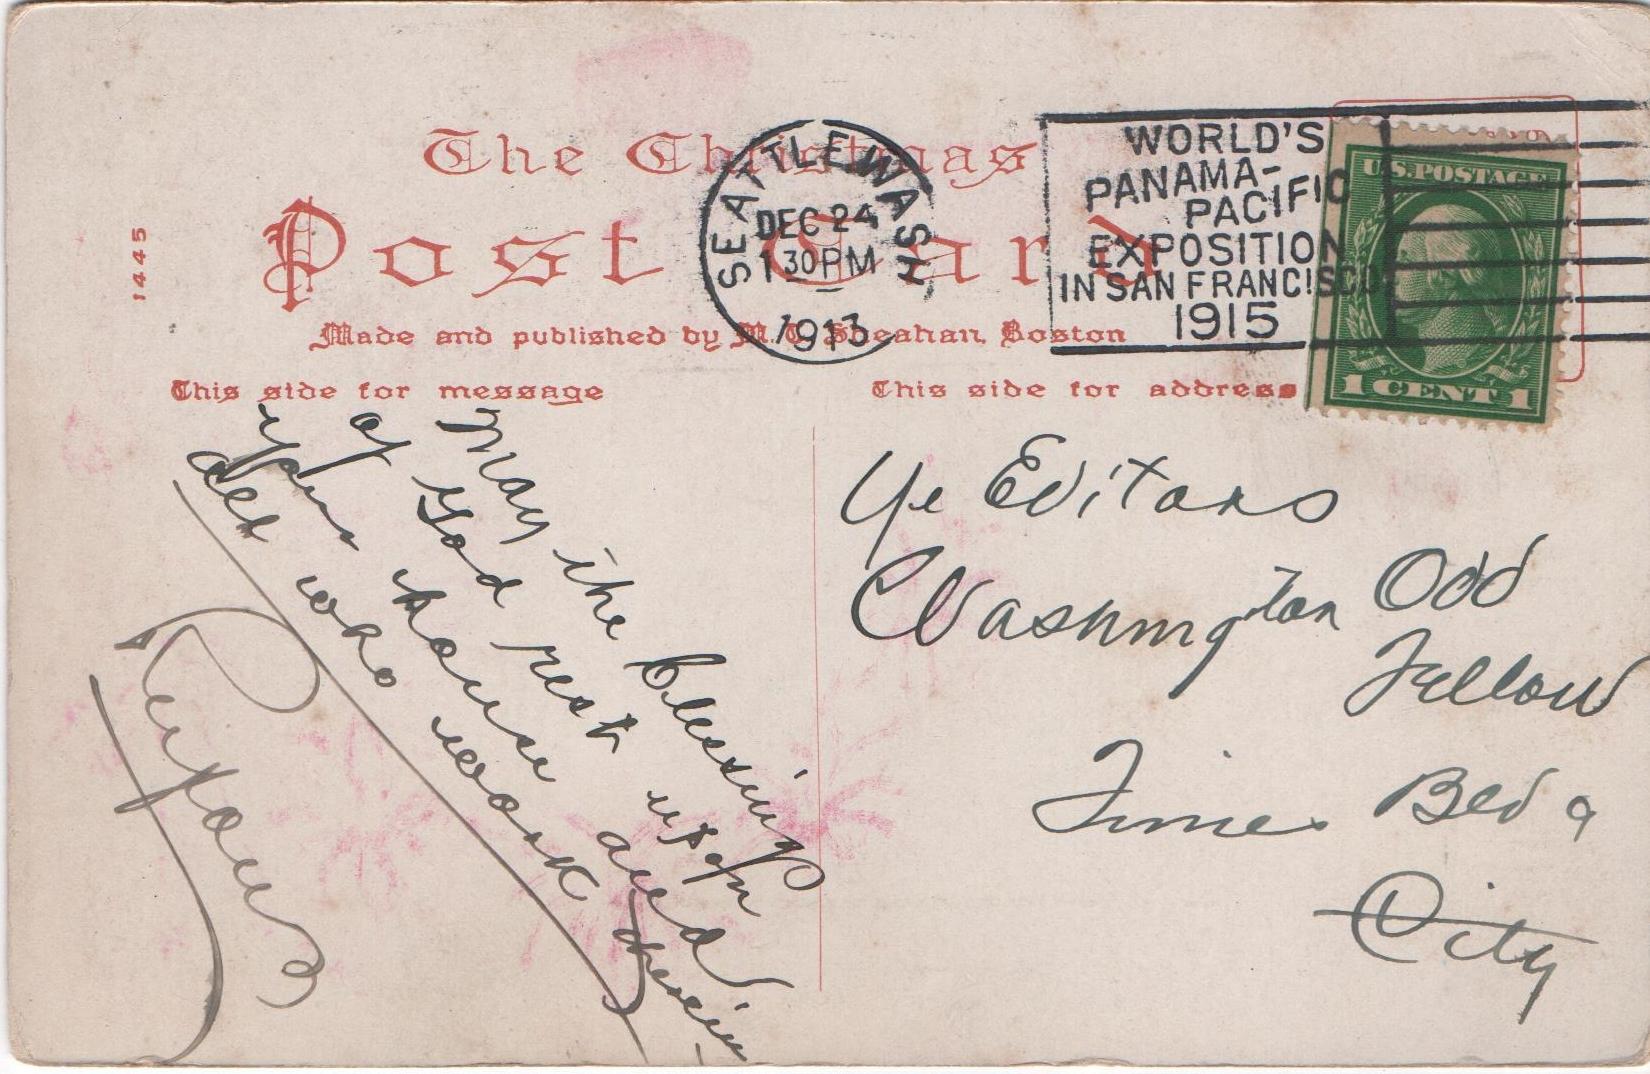 Postcard mailed from Seattle, Washington, on Christmas Eve 1913.